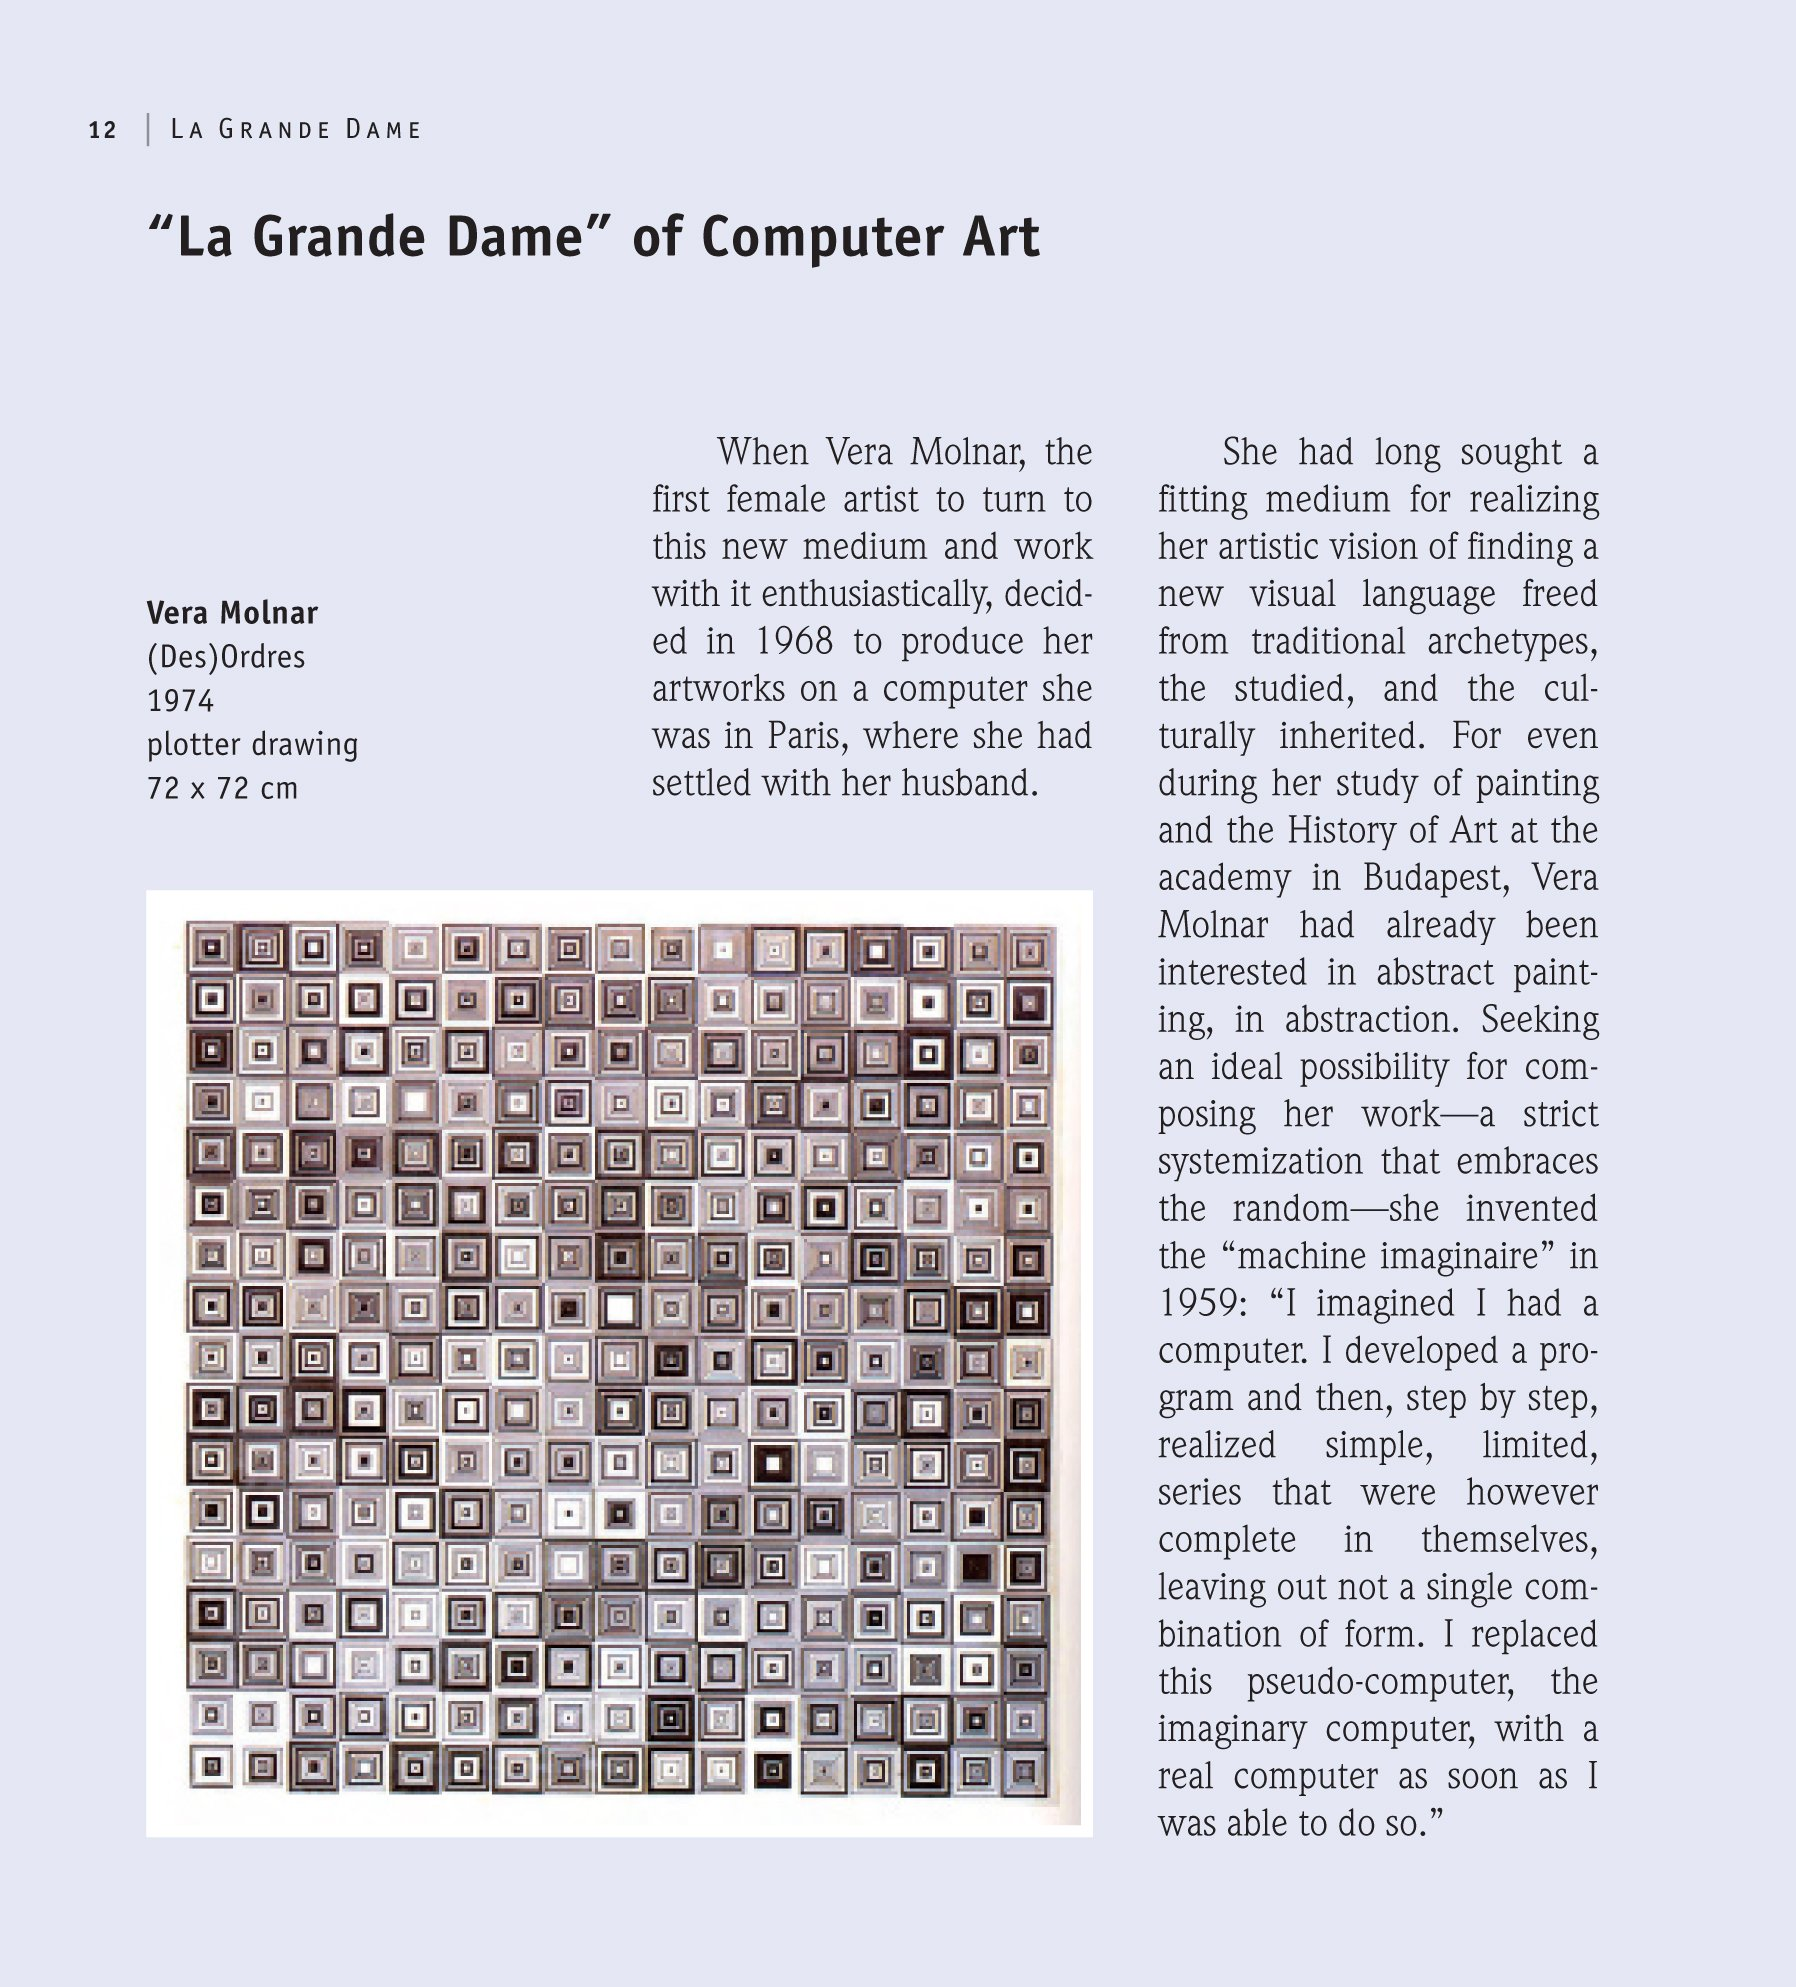 Digital art (ART POCKET): Amazon.es: Lieser, Wolf: Libros en idiomas extranjeros